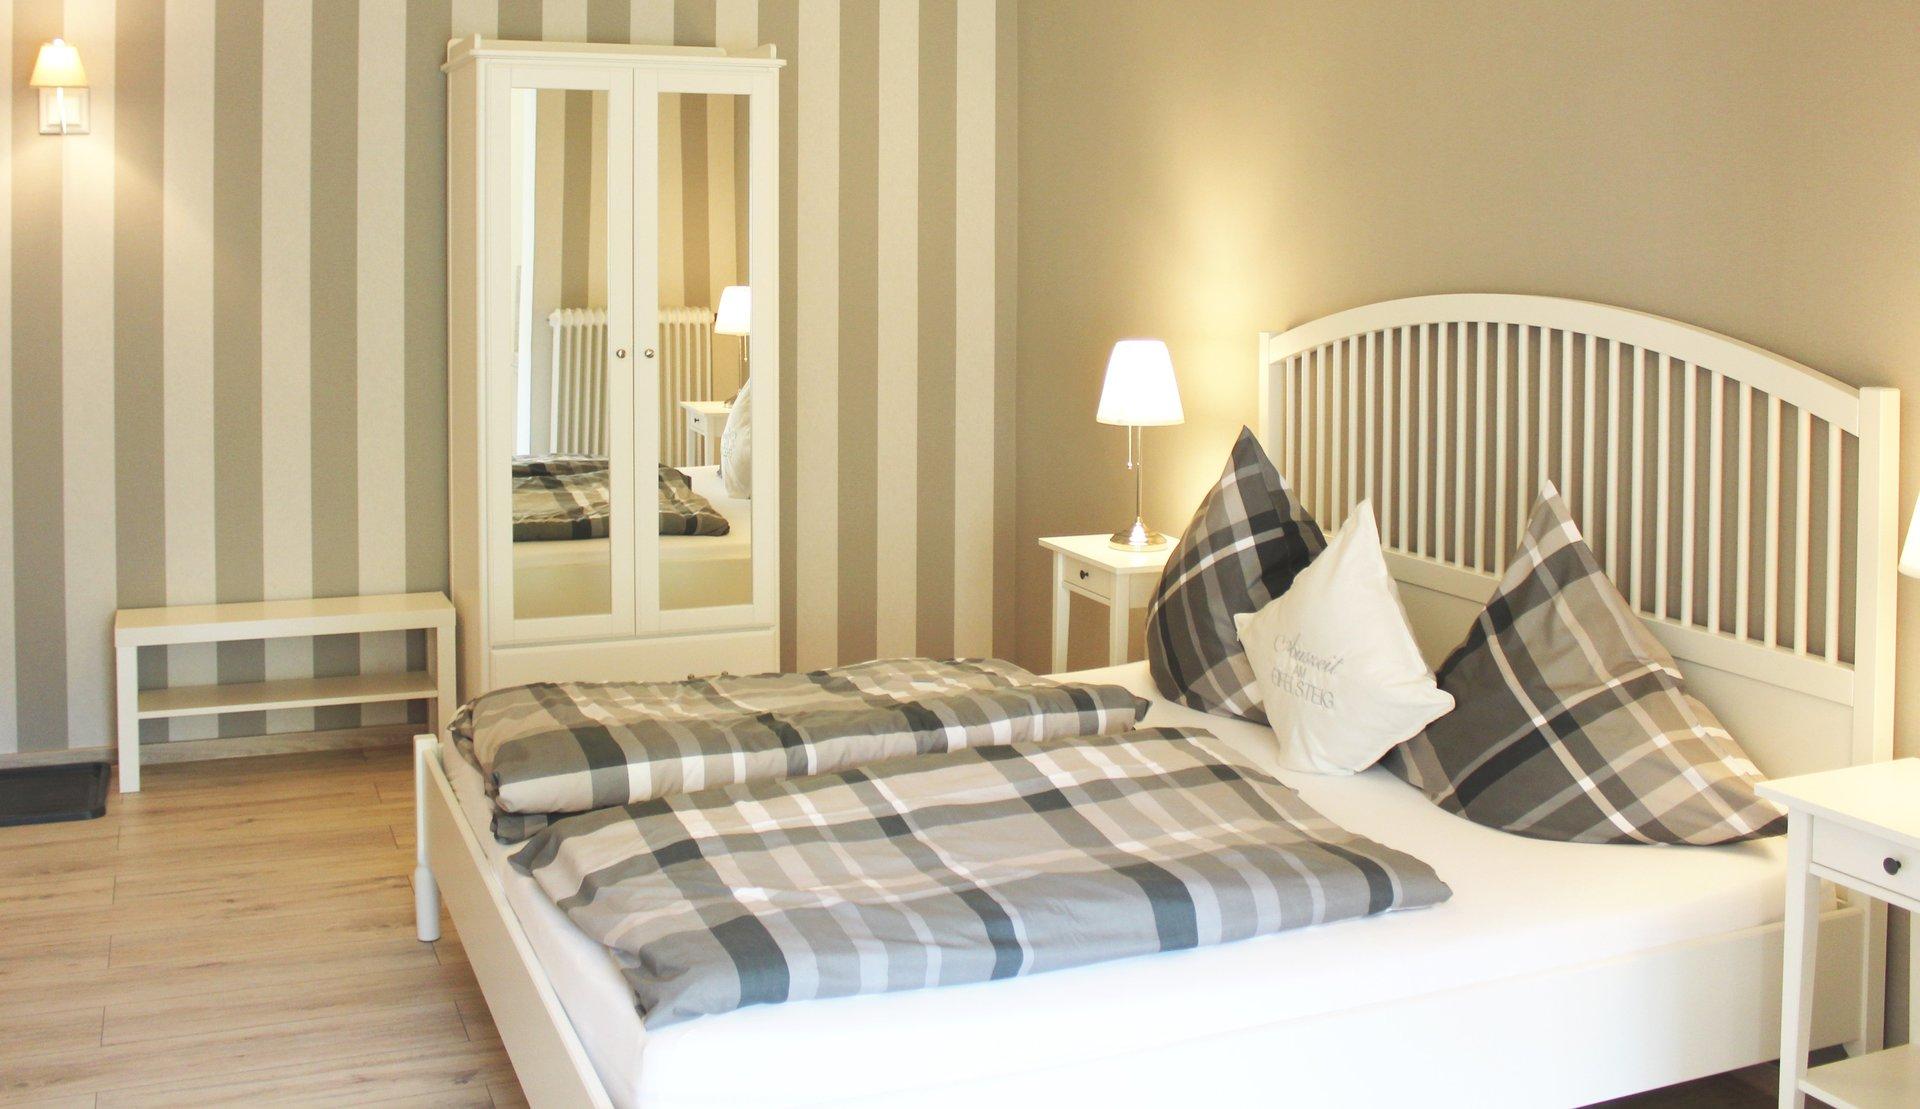 Home for Design hotel eifel